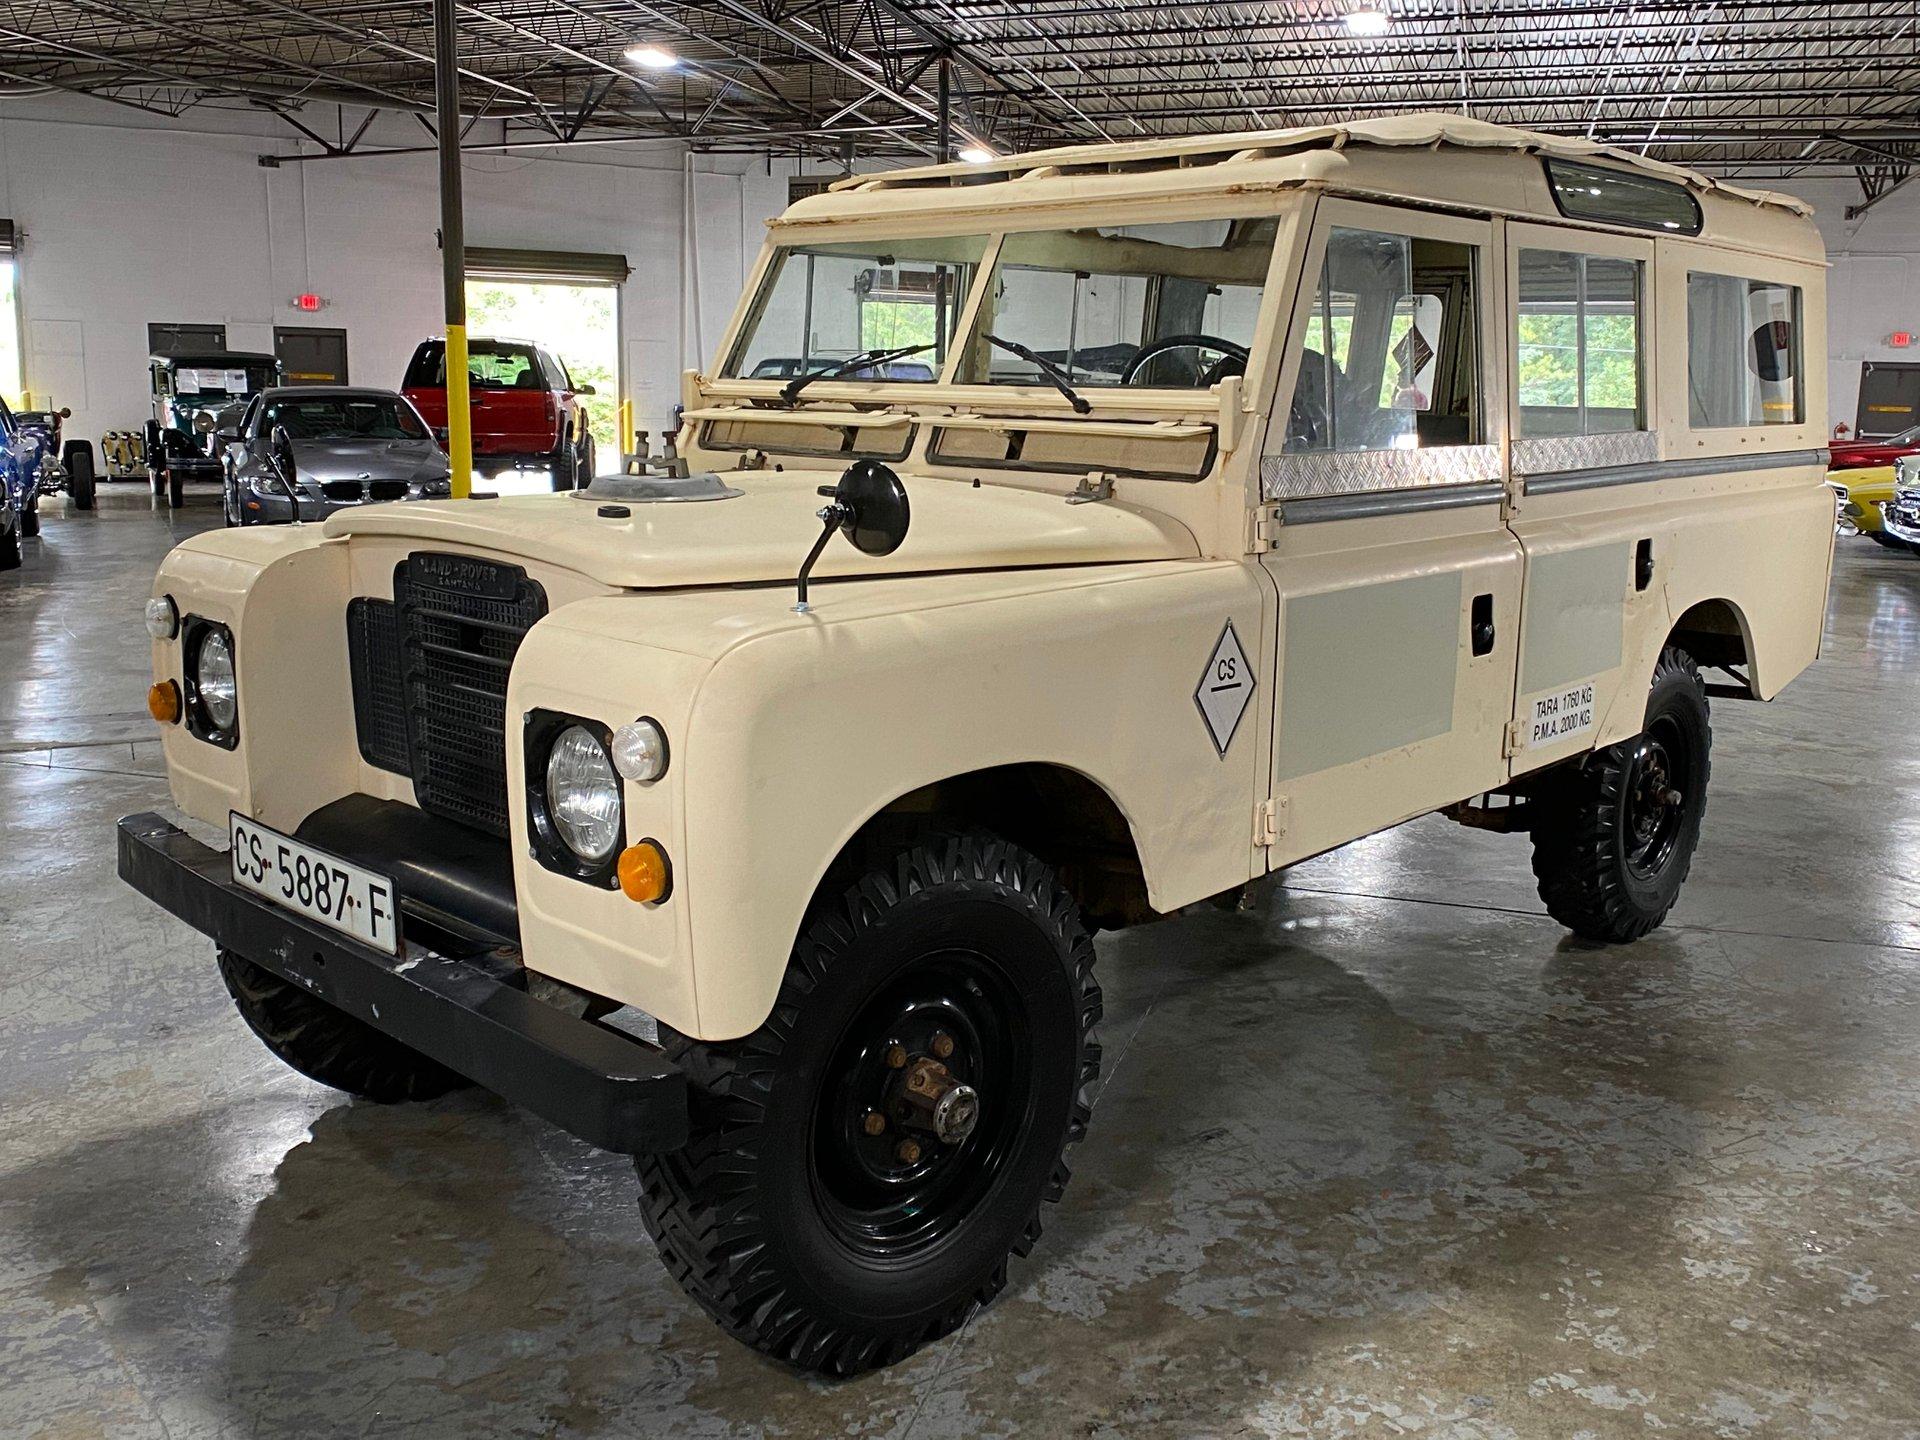 1978 land rover series iii santana